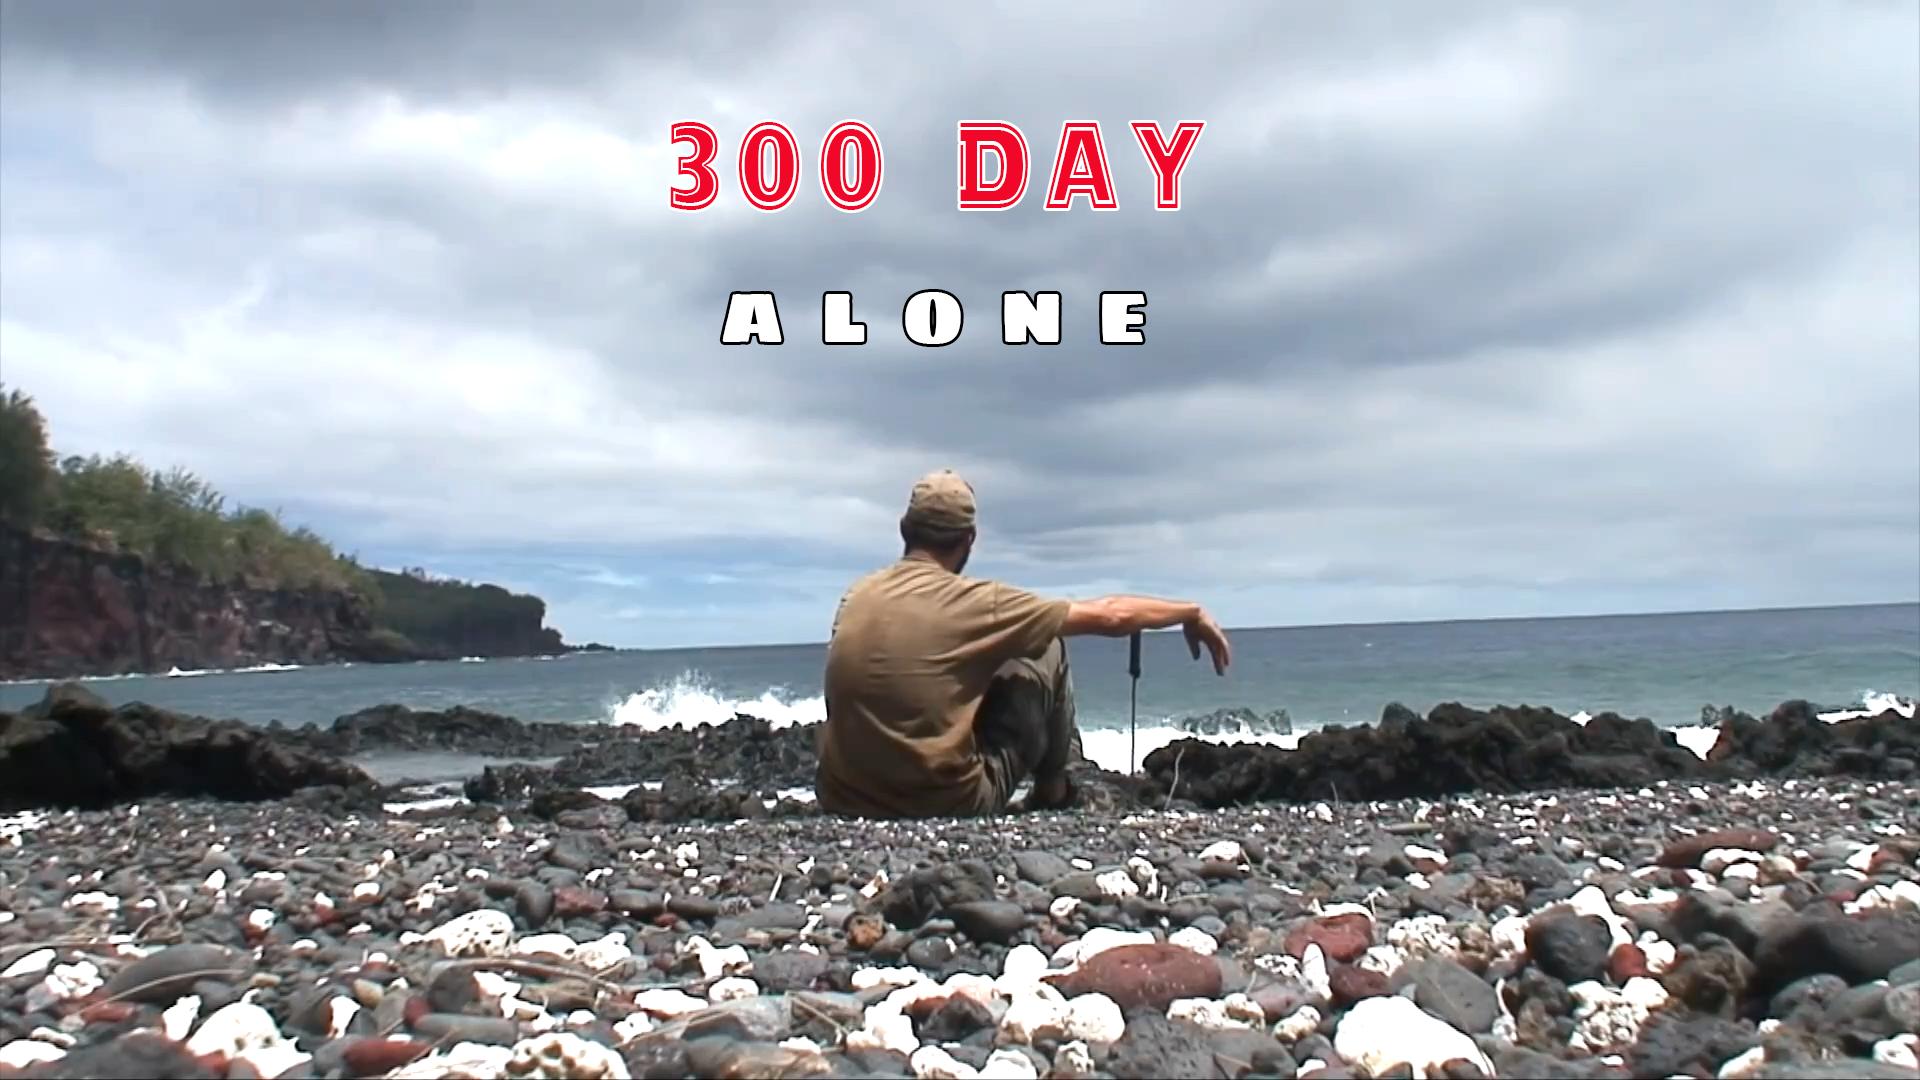 300 Day Alone